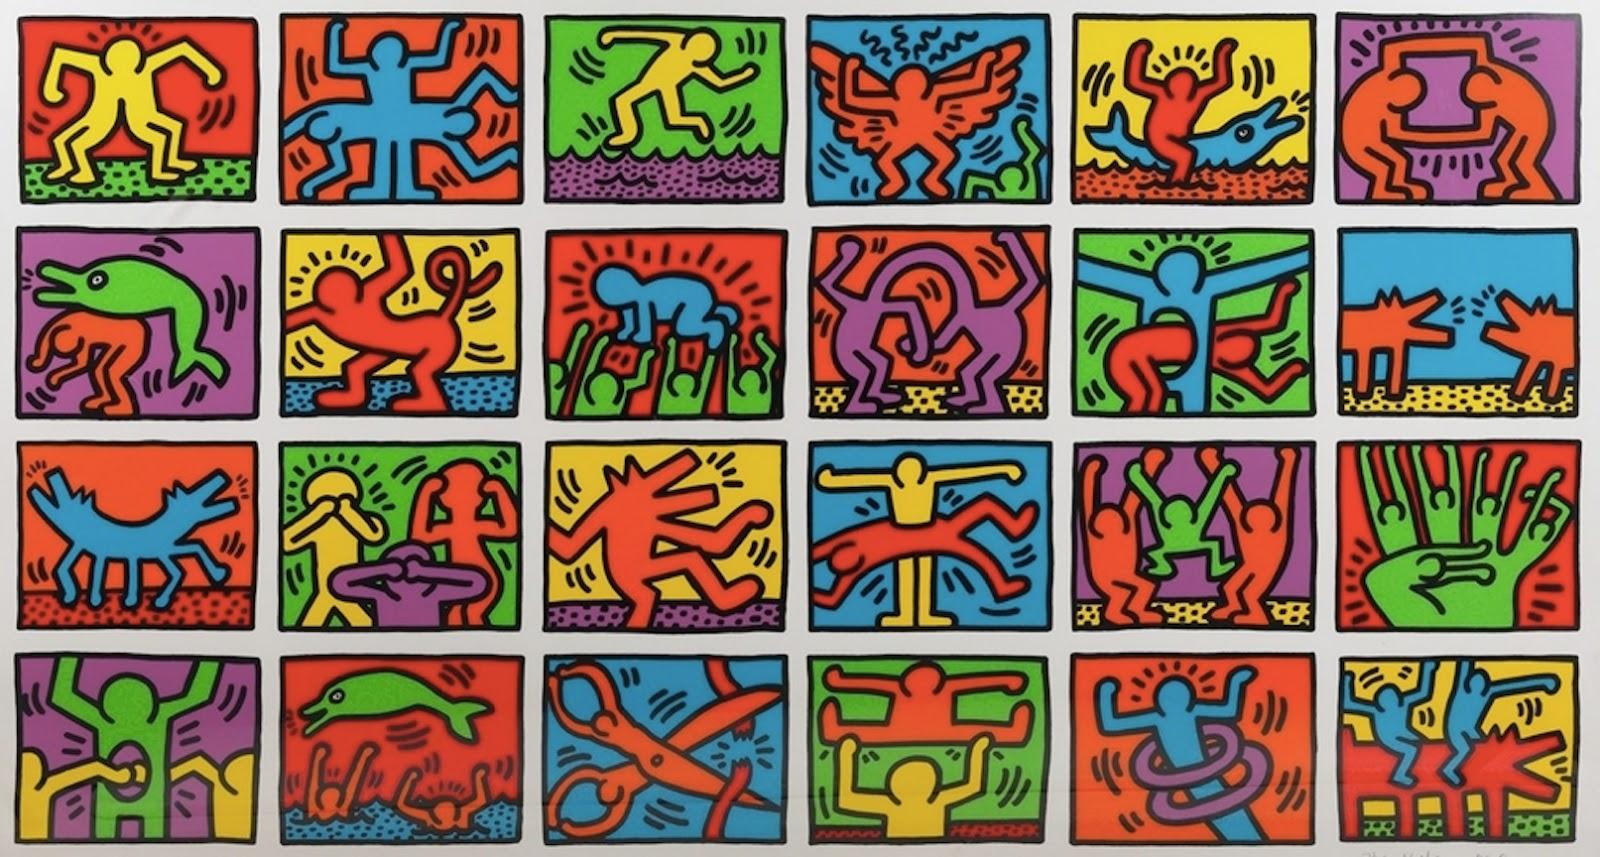 Artimus Prime 8th Gesture Drawing Semiotics And Keith Haring